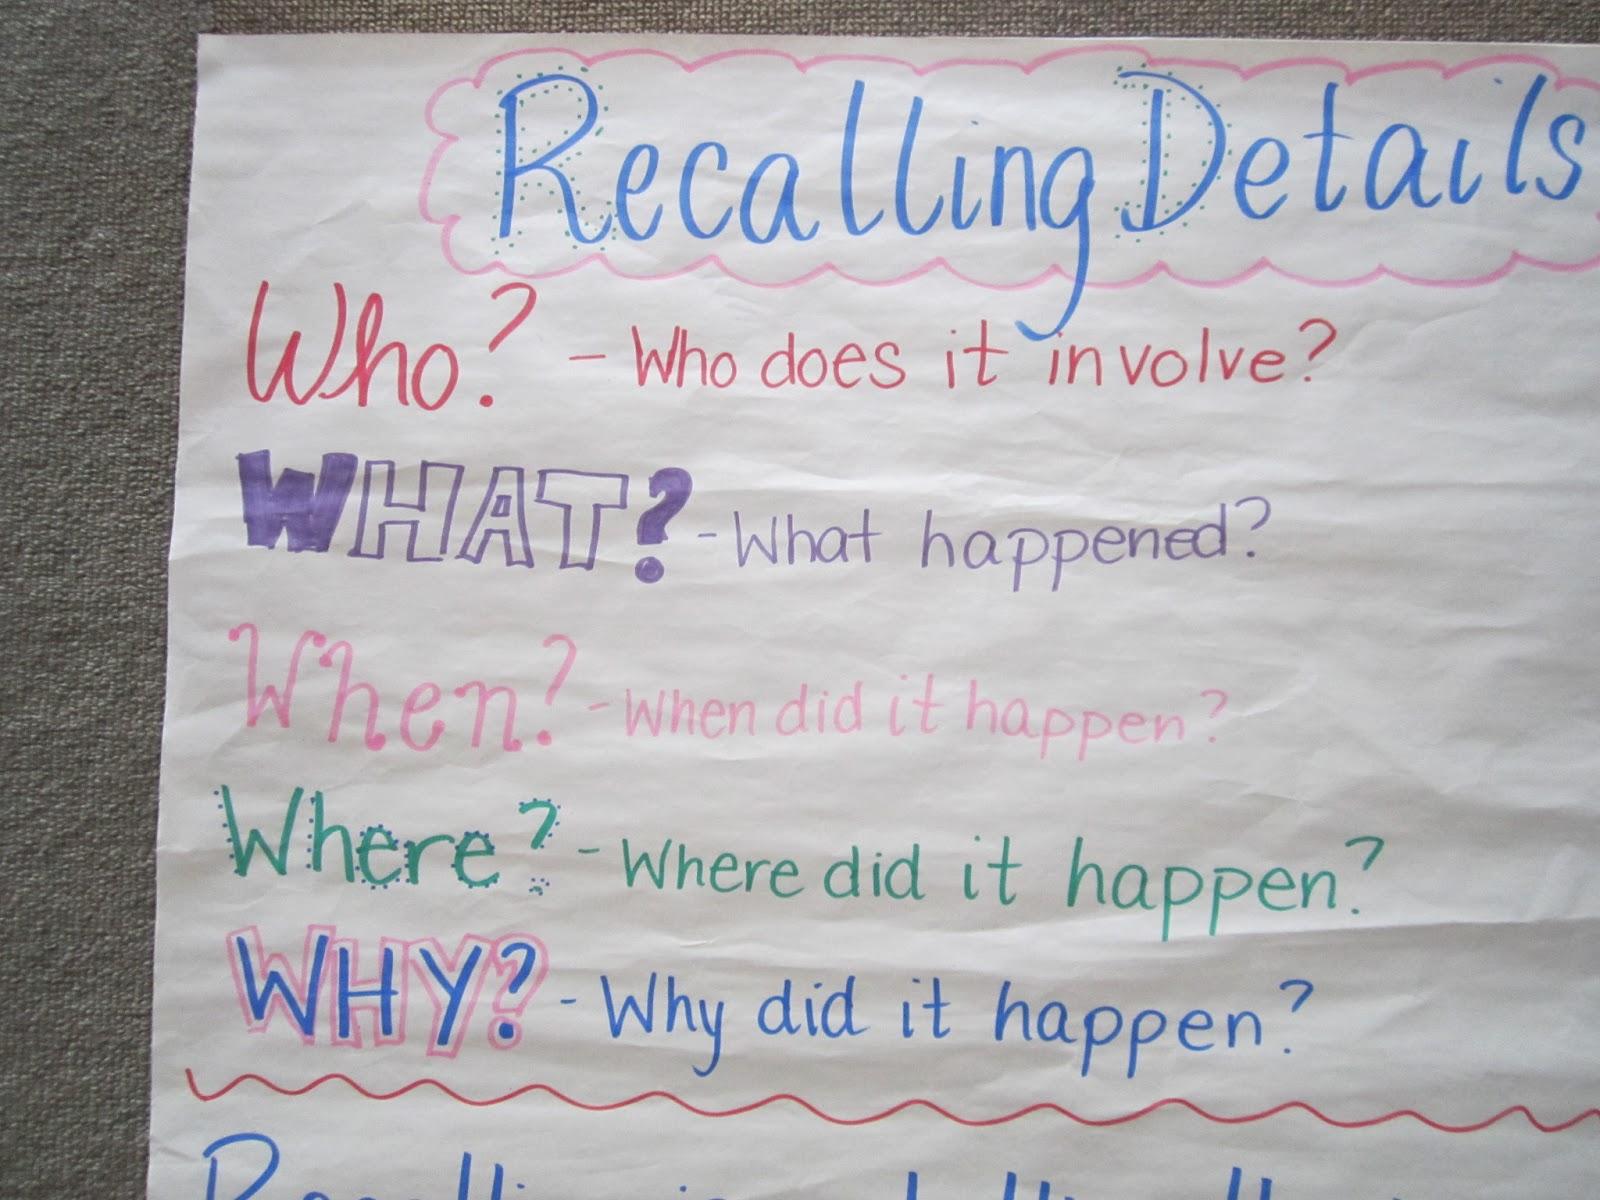 Miss A S Class Ideas Recalling Details The 5 W S